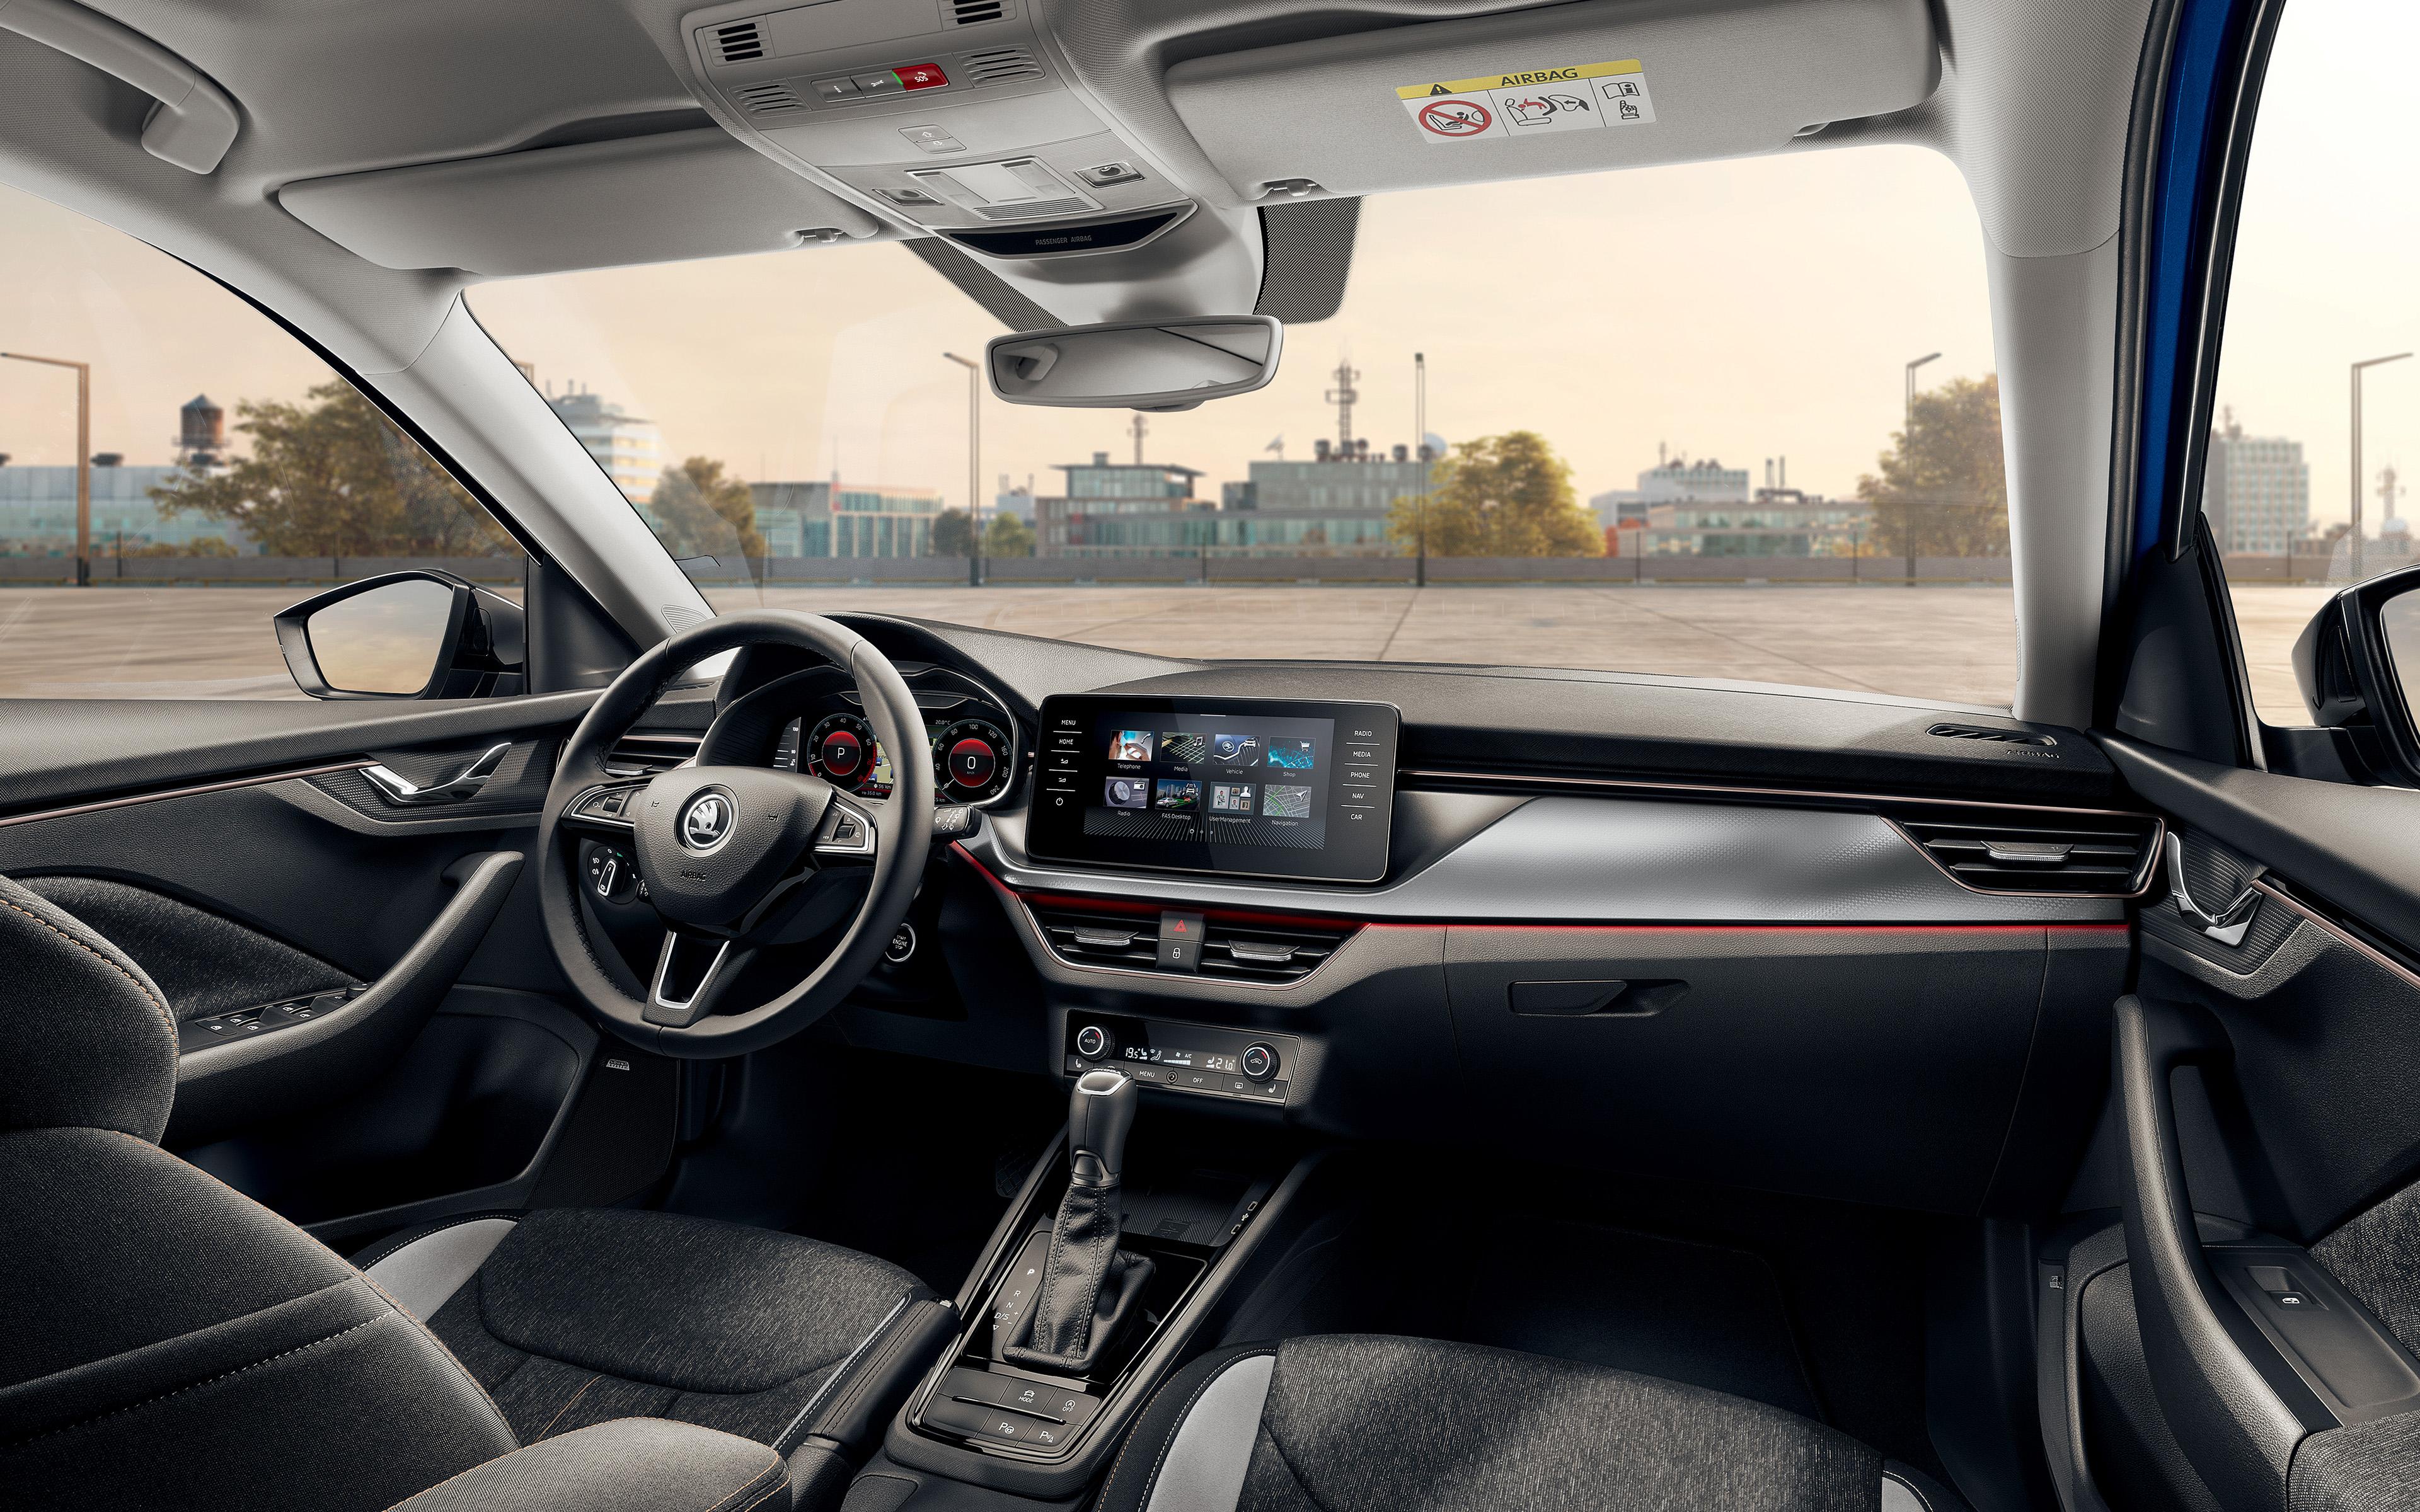 Download wallpapers 2019 Skoda Scala interior 4k view inside 3840x2400